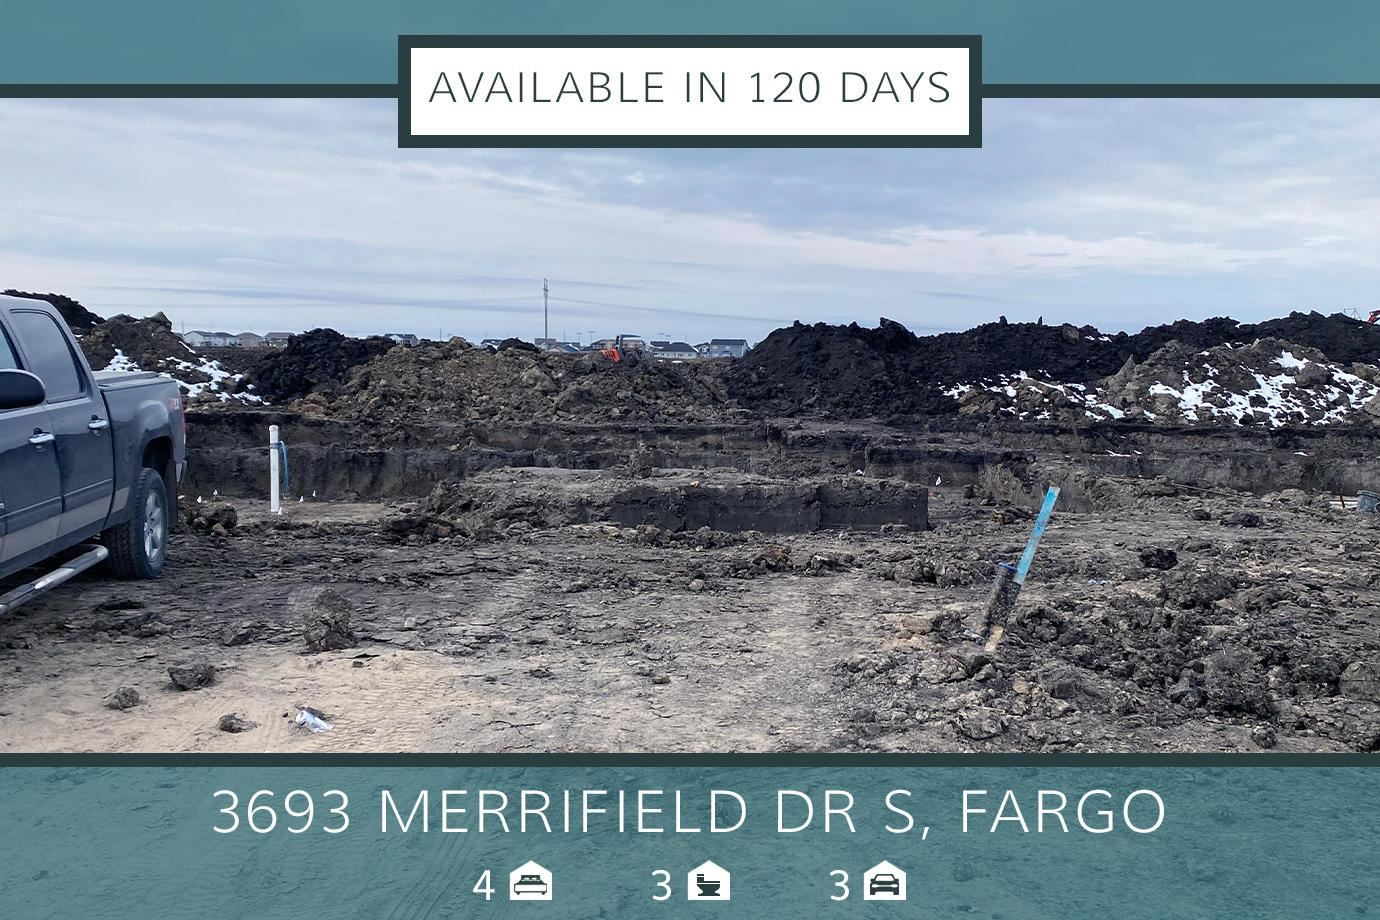 3693 MERRIFIELD Drive S, Fargo, ND 58104 - #: 20-5579